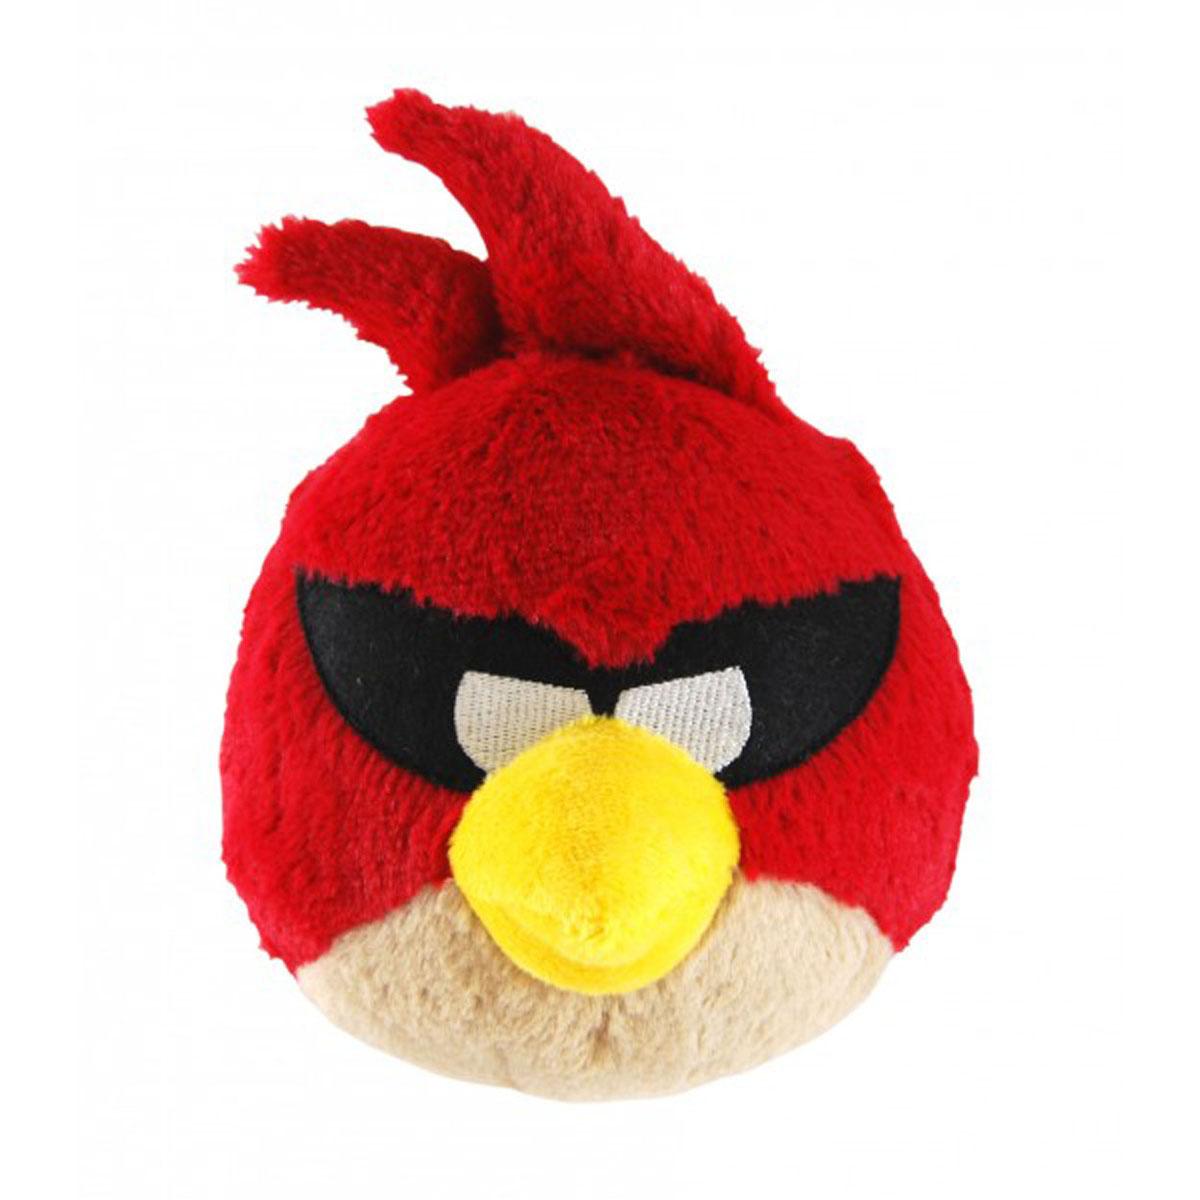 "Мягкая игрушка ""Angry Birds Space"", красная птица, со звуком, 40 см"